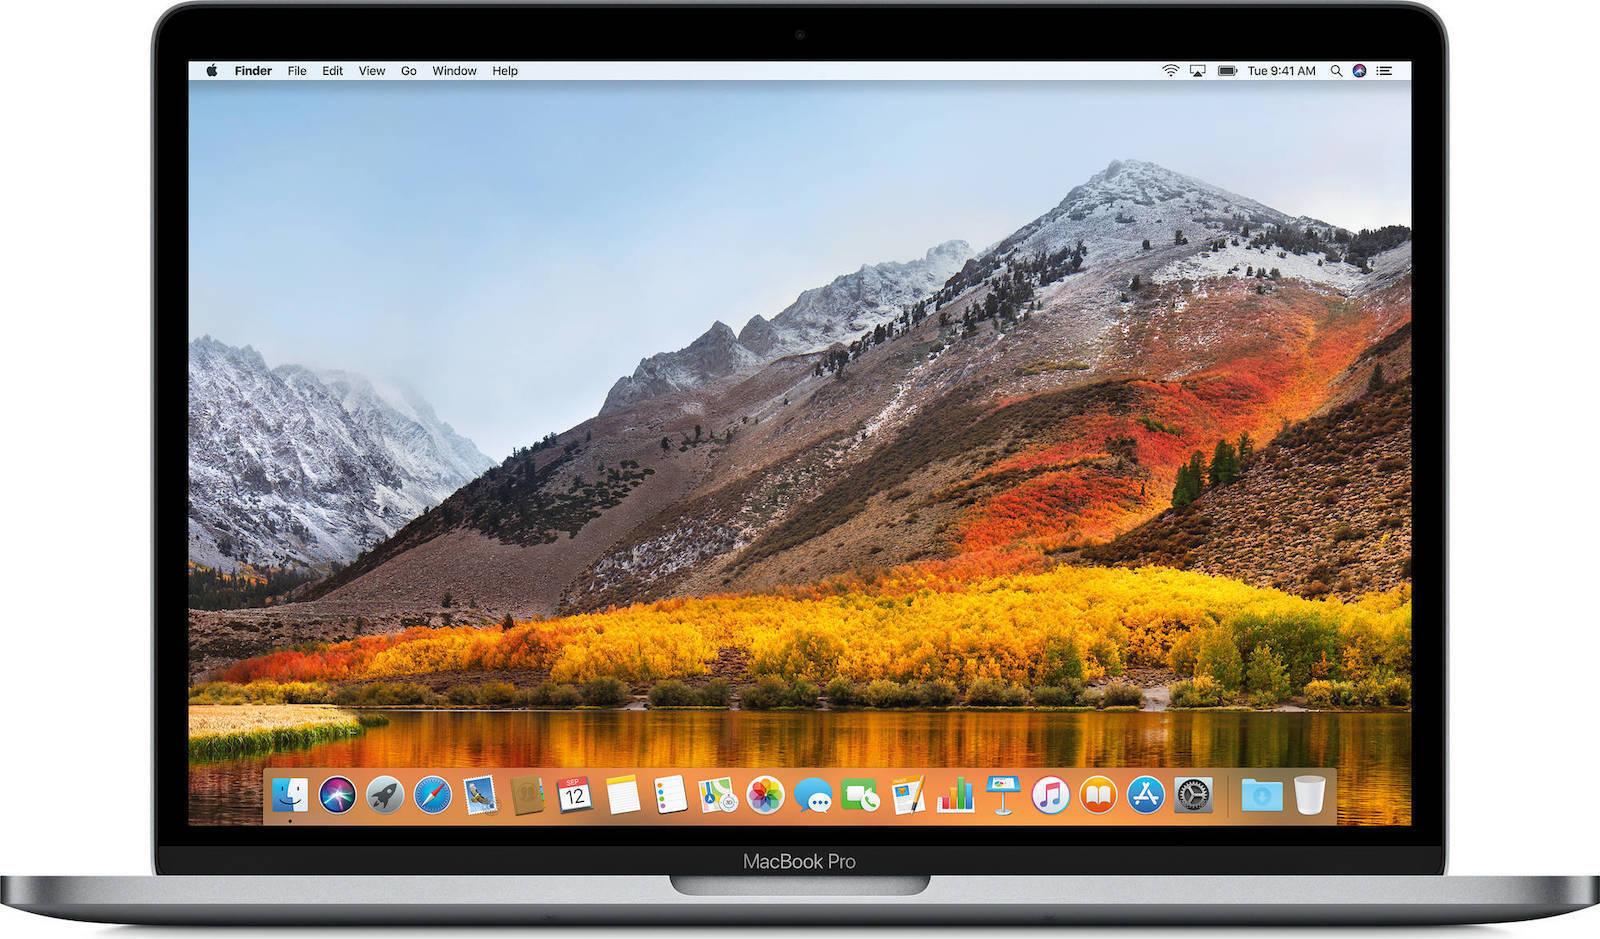 Apple MacBook Pro MR9R2 13.3'' 2.3GHz i5/8GB/512GB With Touch Bar 2018 Space Grey English Keyboard Με Αντάπτορα Πληρωμή έως 24 δόσεις